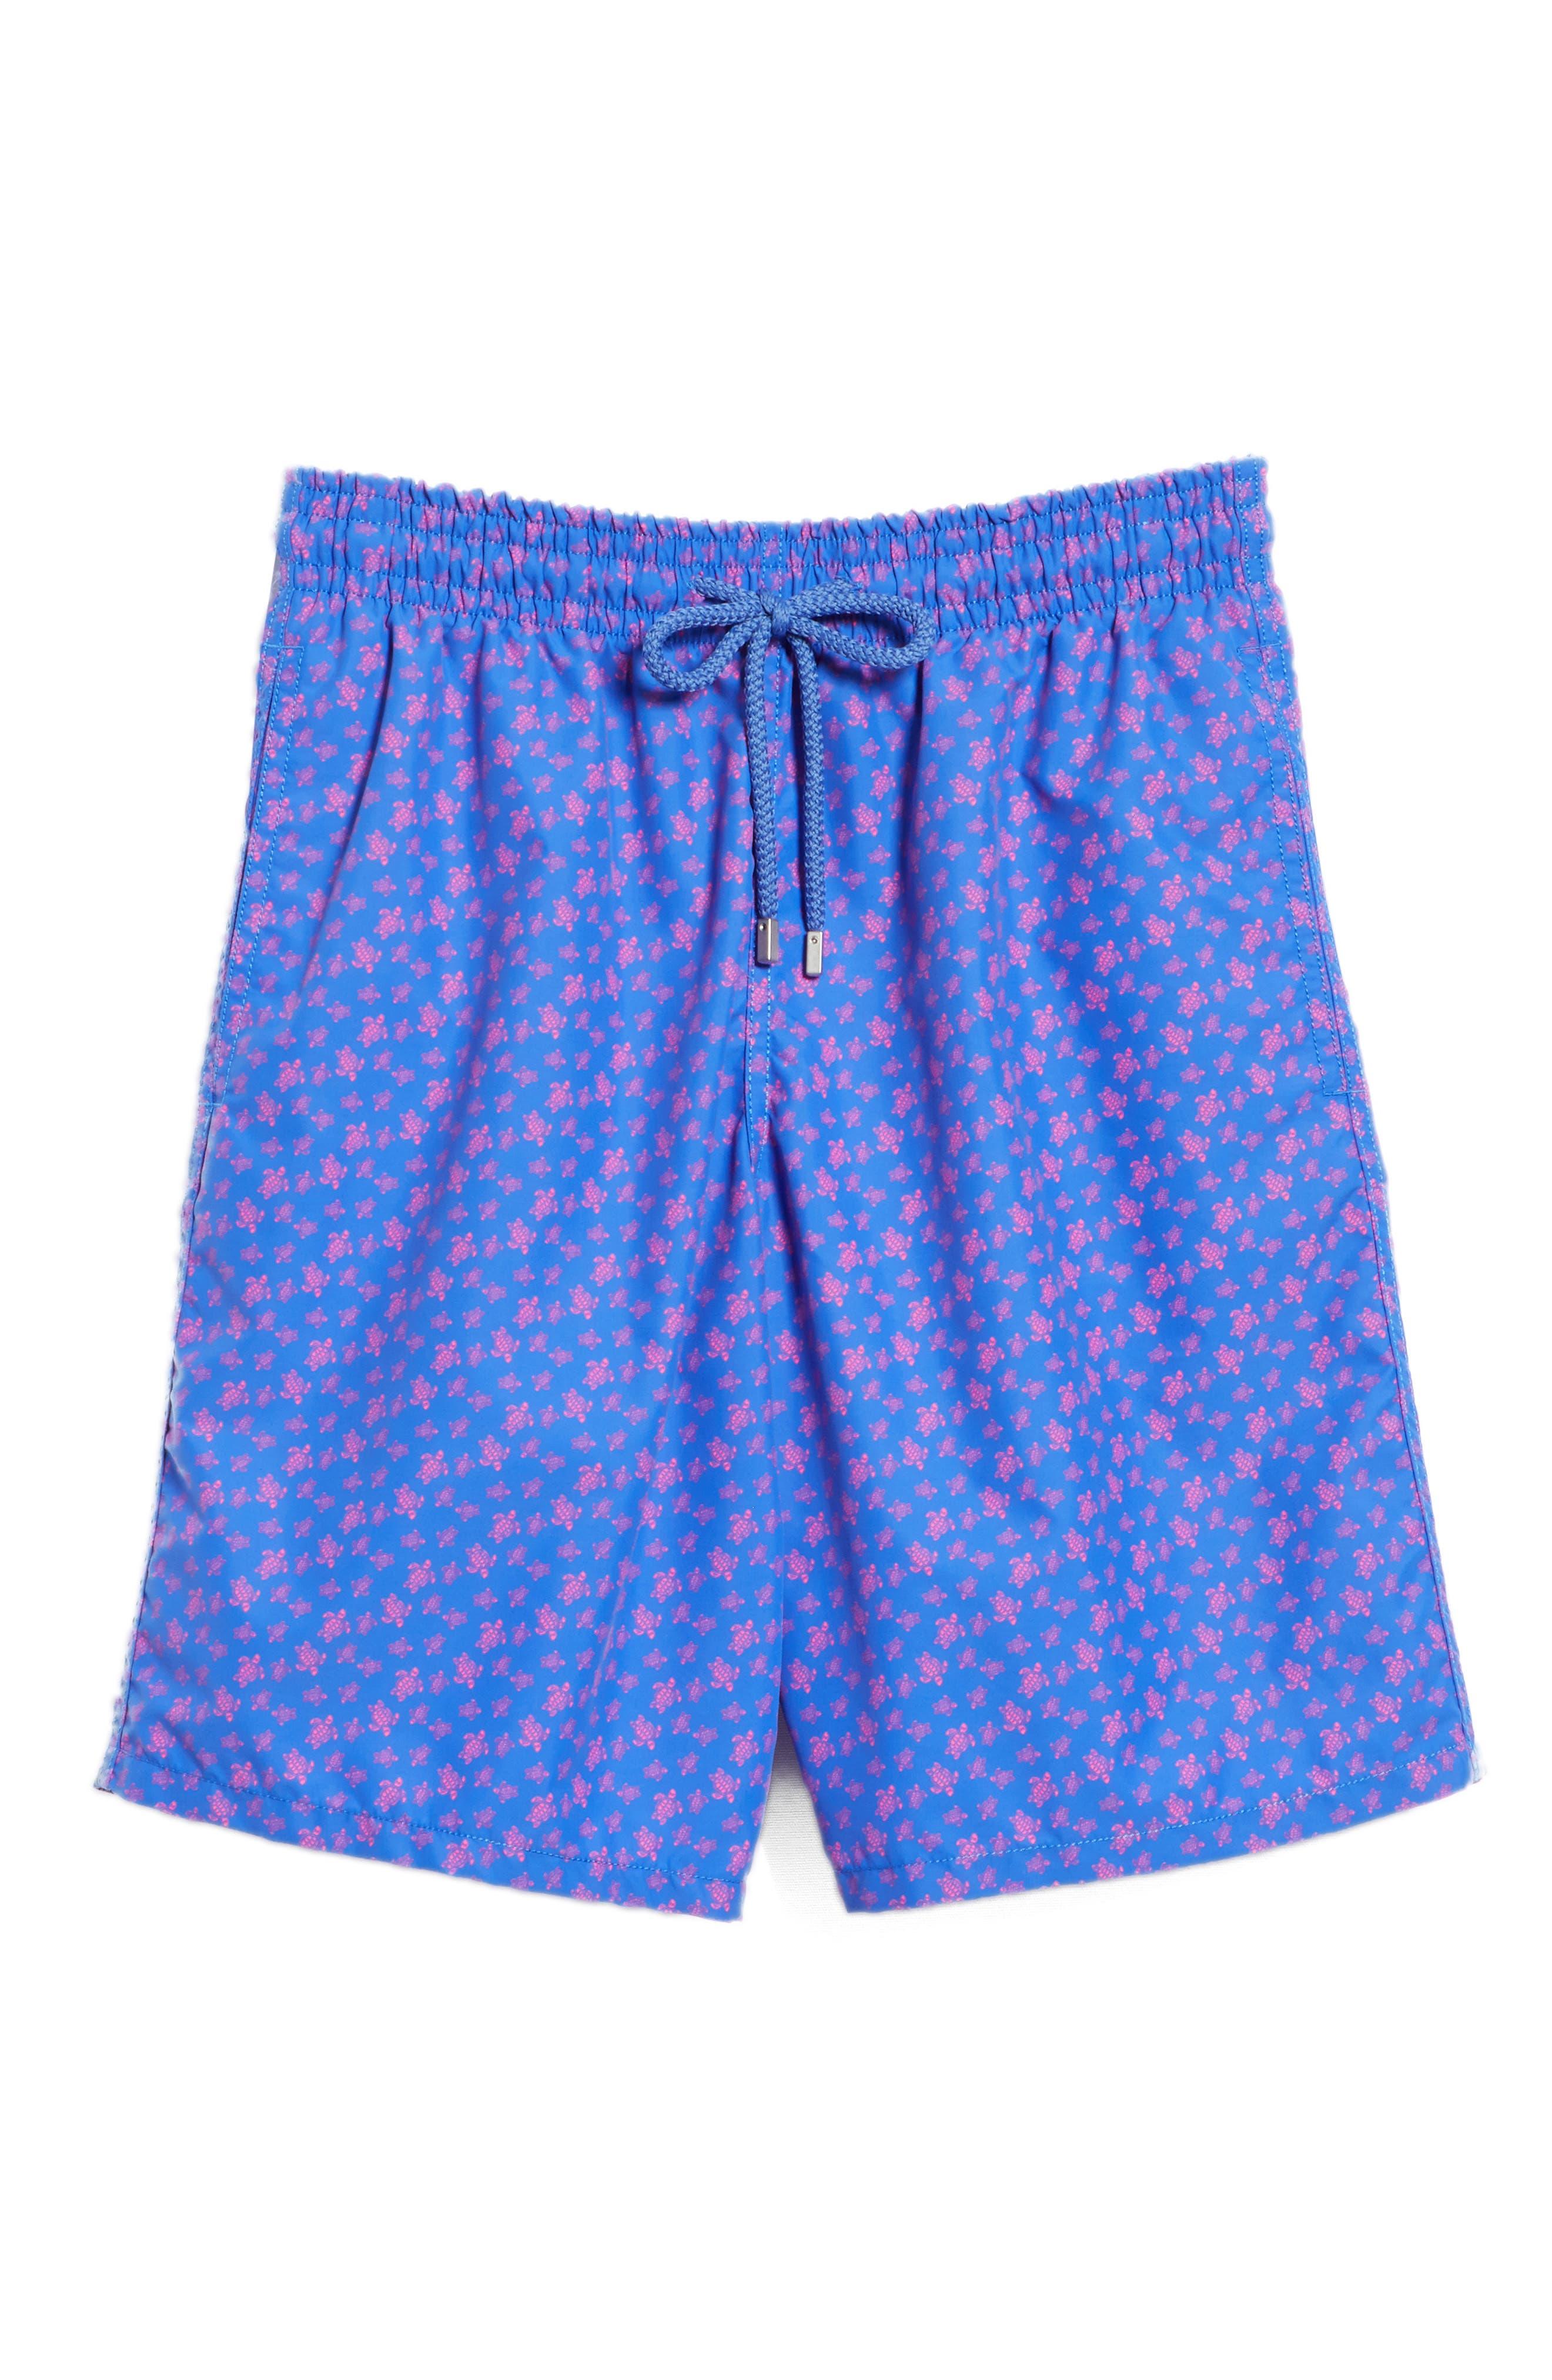 VILEBREQUIN,                             Micro Ronde Turtle Print Swim Trunks,                             Alternate thumbnail 6, color,                             BLUE